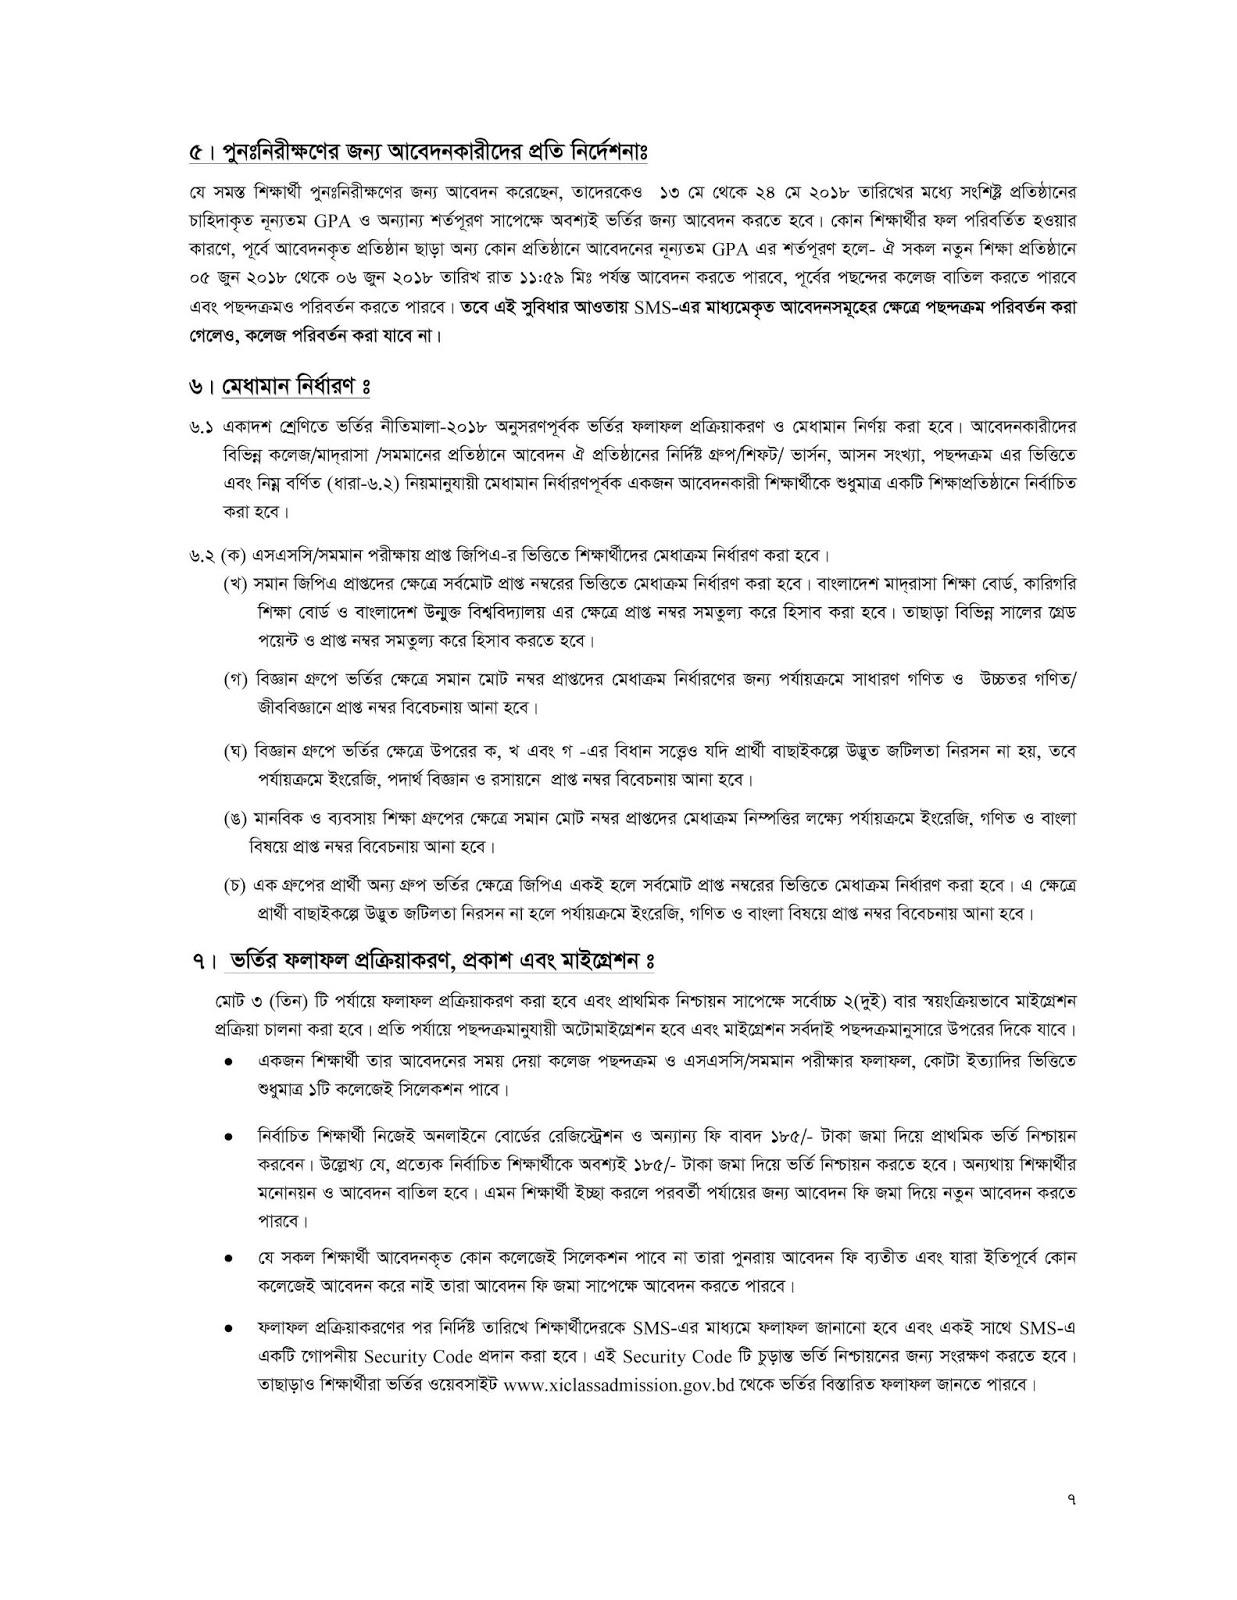 HSC Admission 2018 Notice   College Admission Circular 2018-19 Form   XI Admission 2018